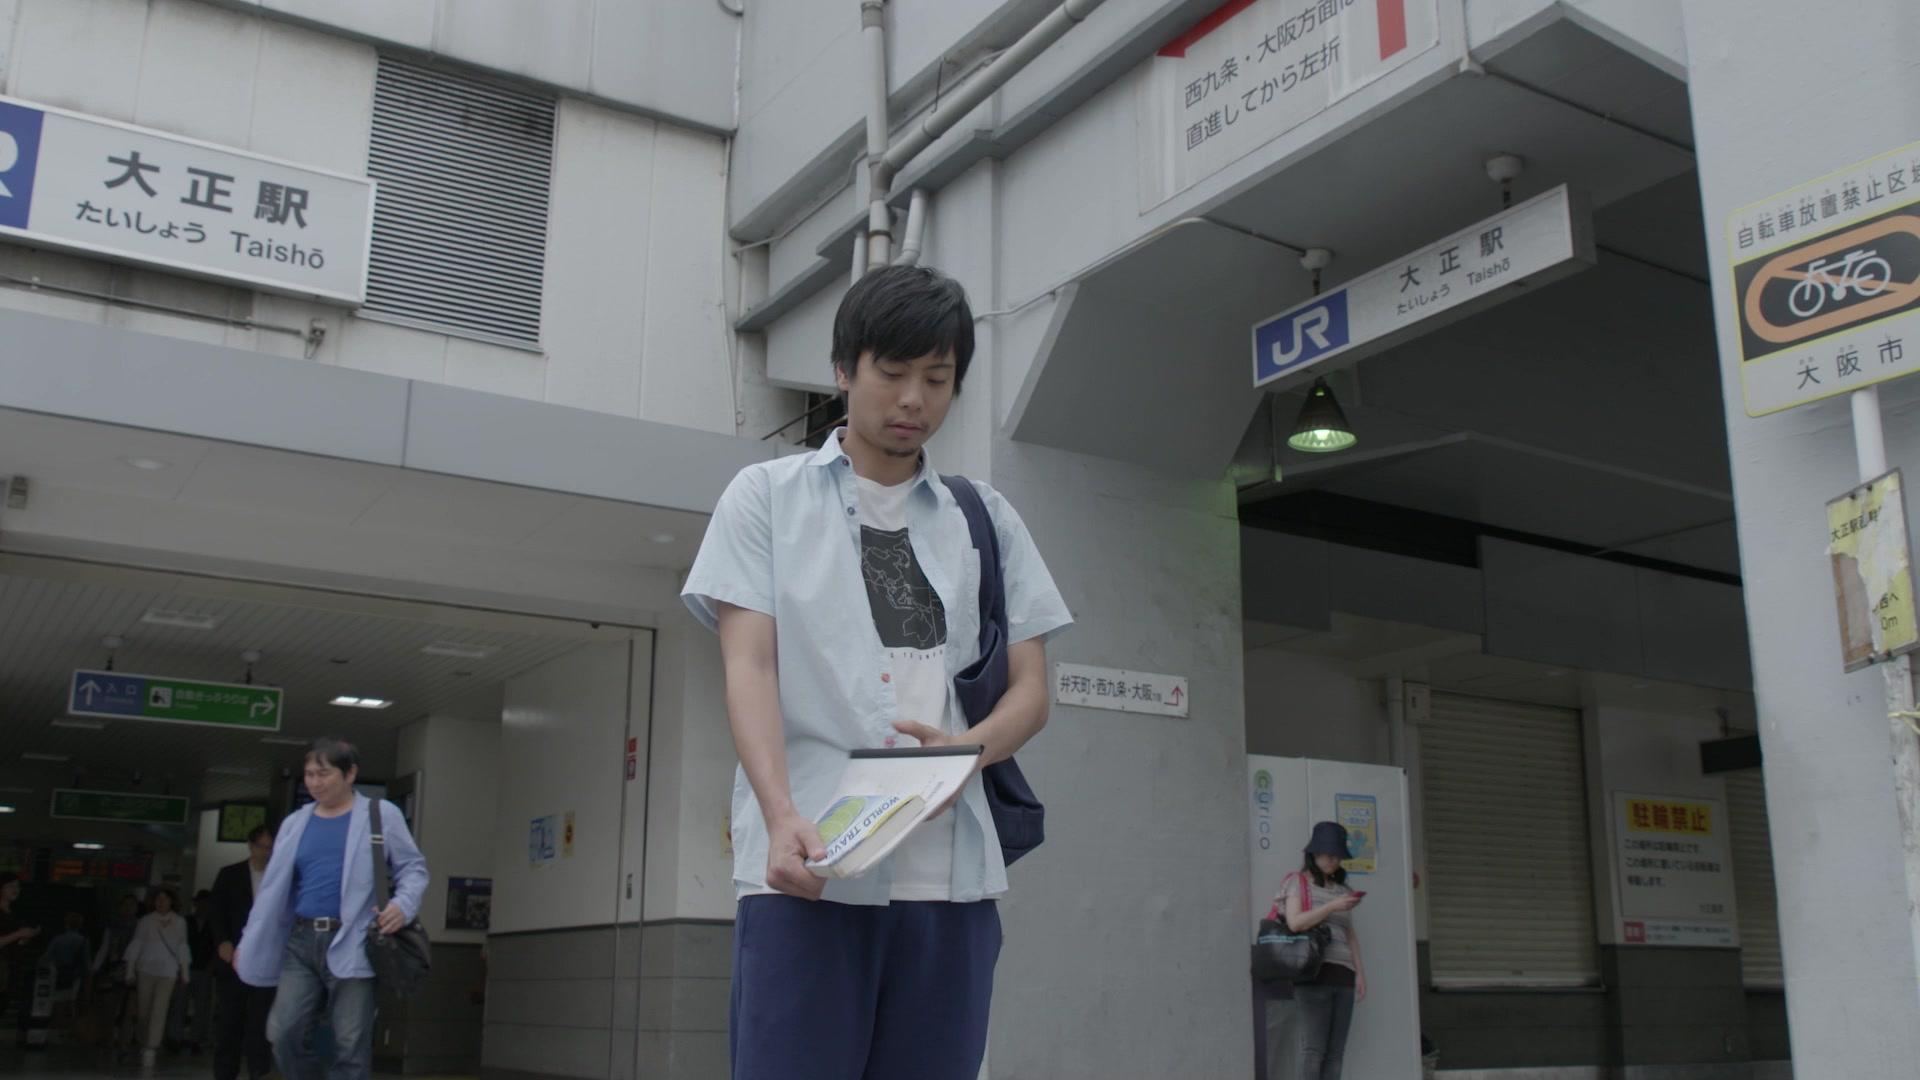 Osaka Loop Line Episode 3